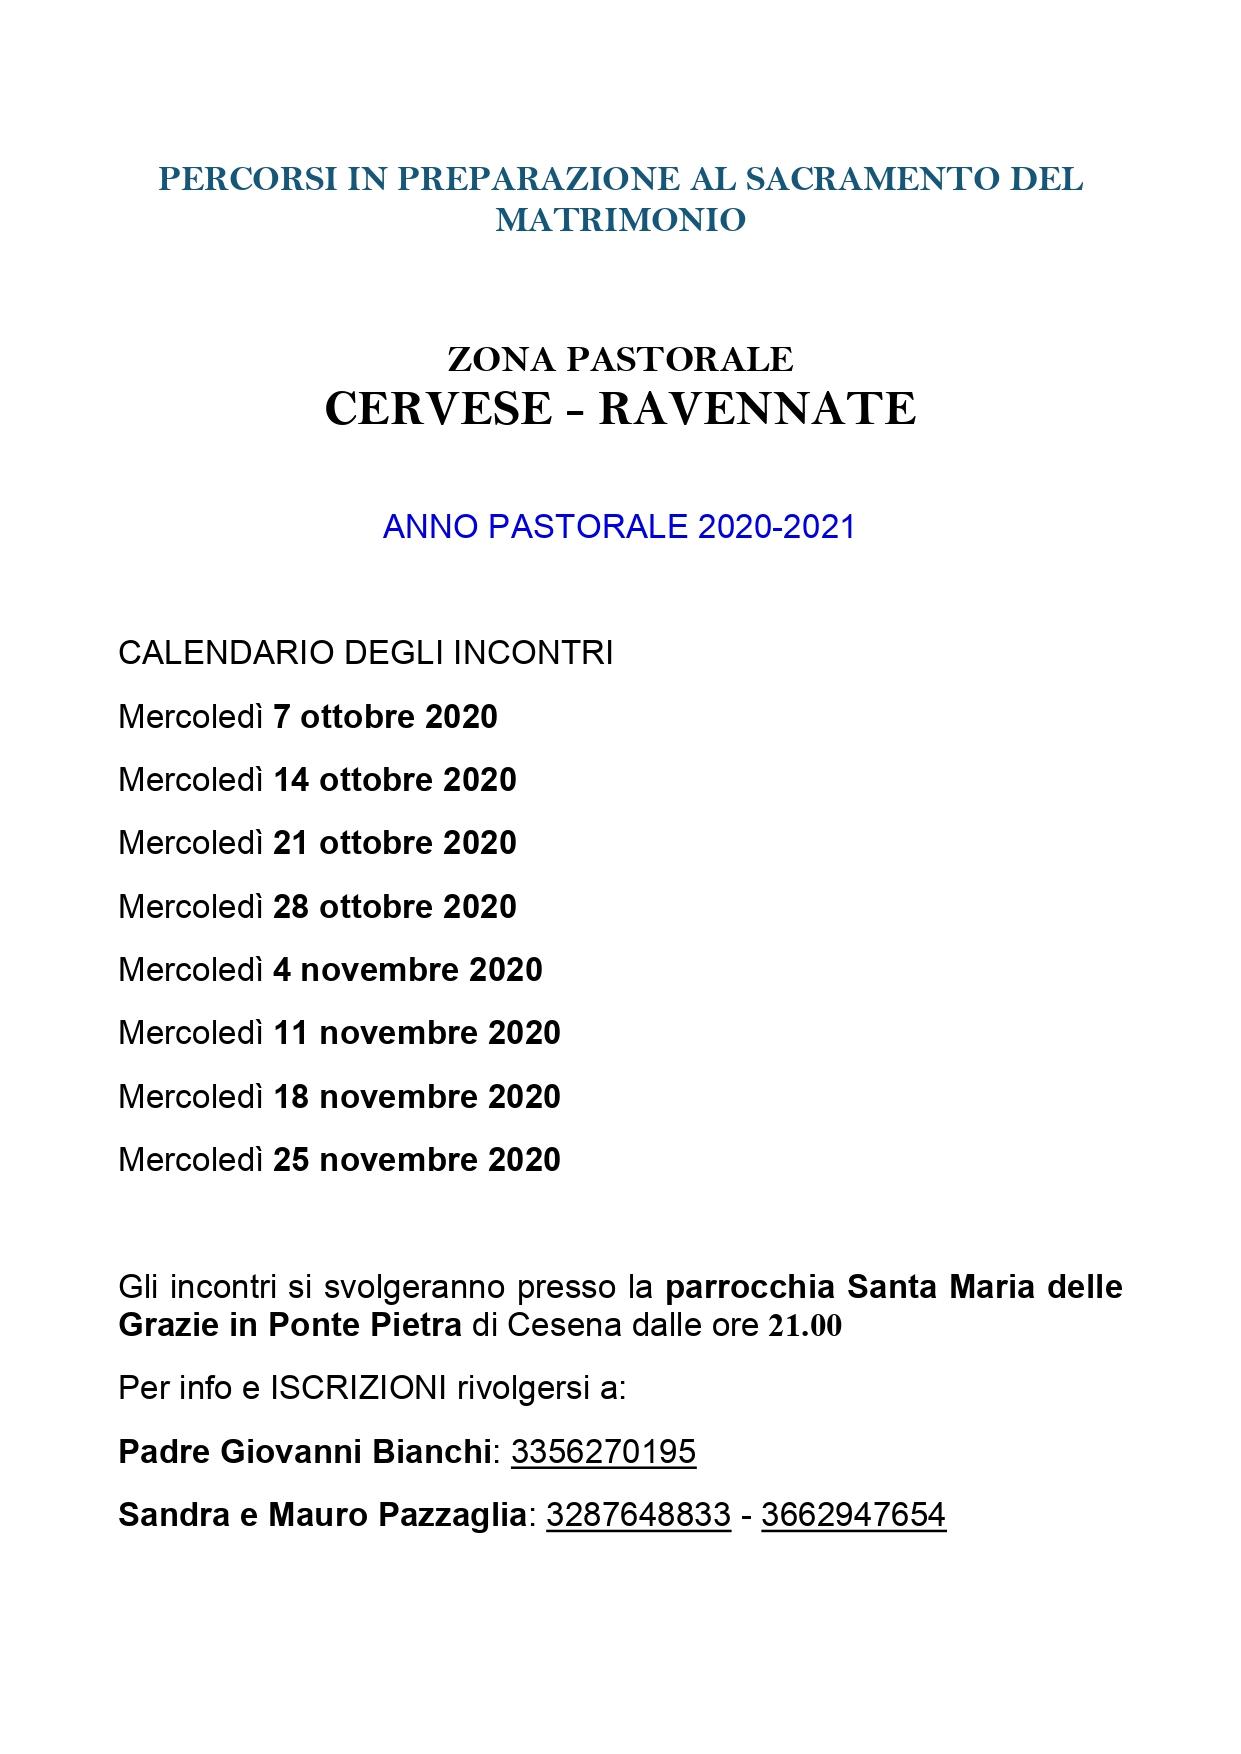 ZONA CERVESE RAVENNATE_INCONTRI PRE MATRIMONIALI_2020-2021